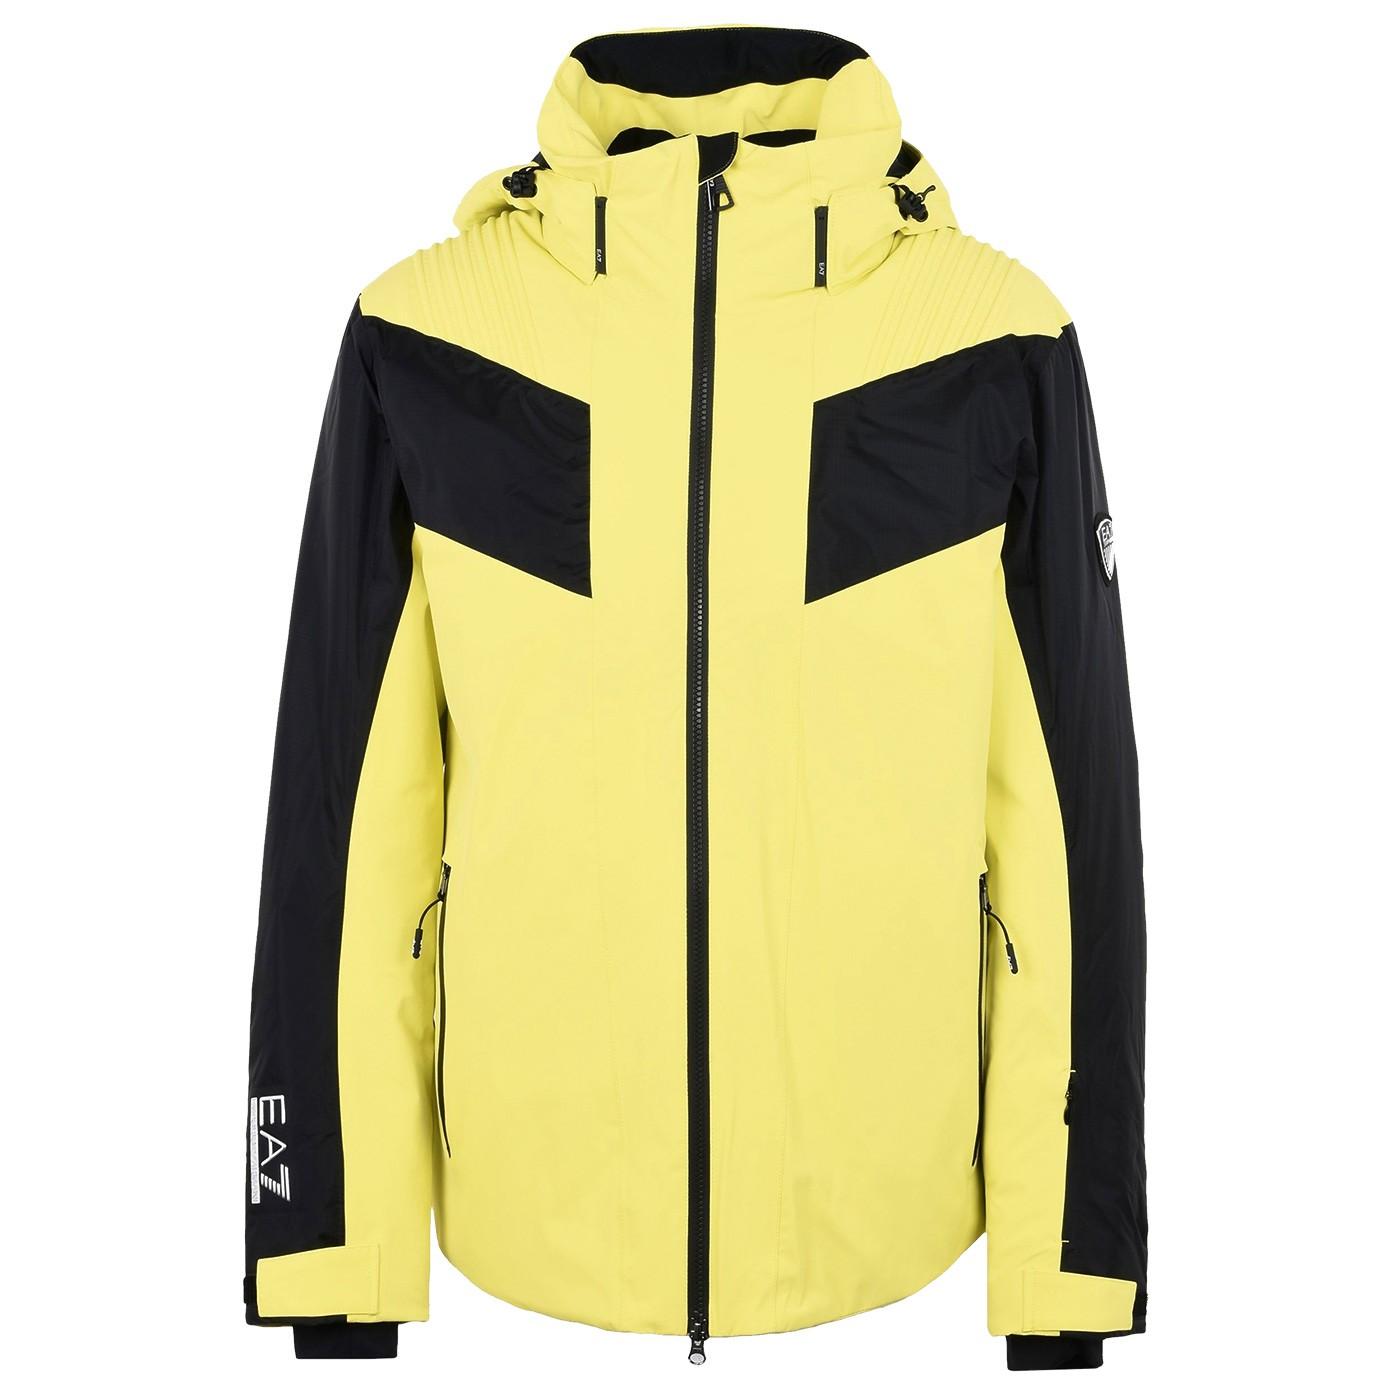 buy online c71b5 7622e Giacca sci Ea7 6YPG05 Uomo giallo